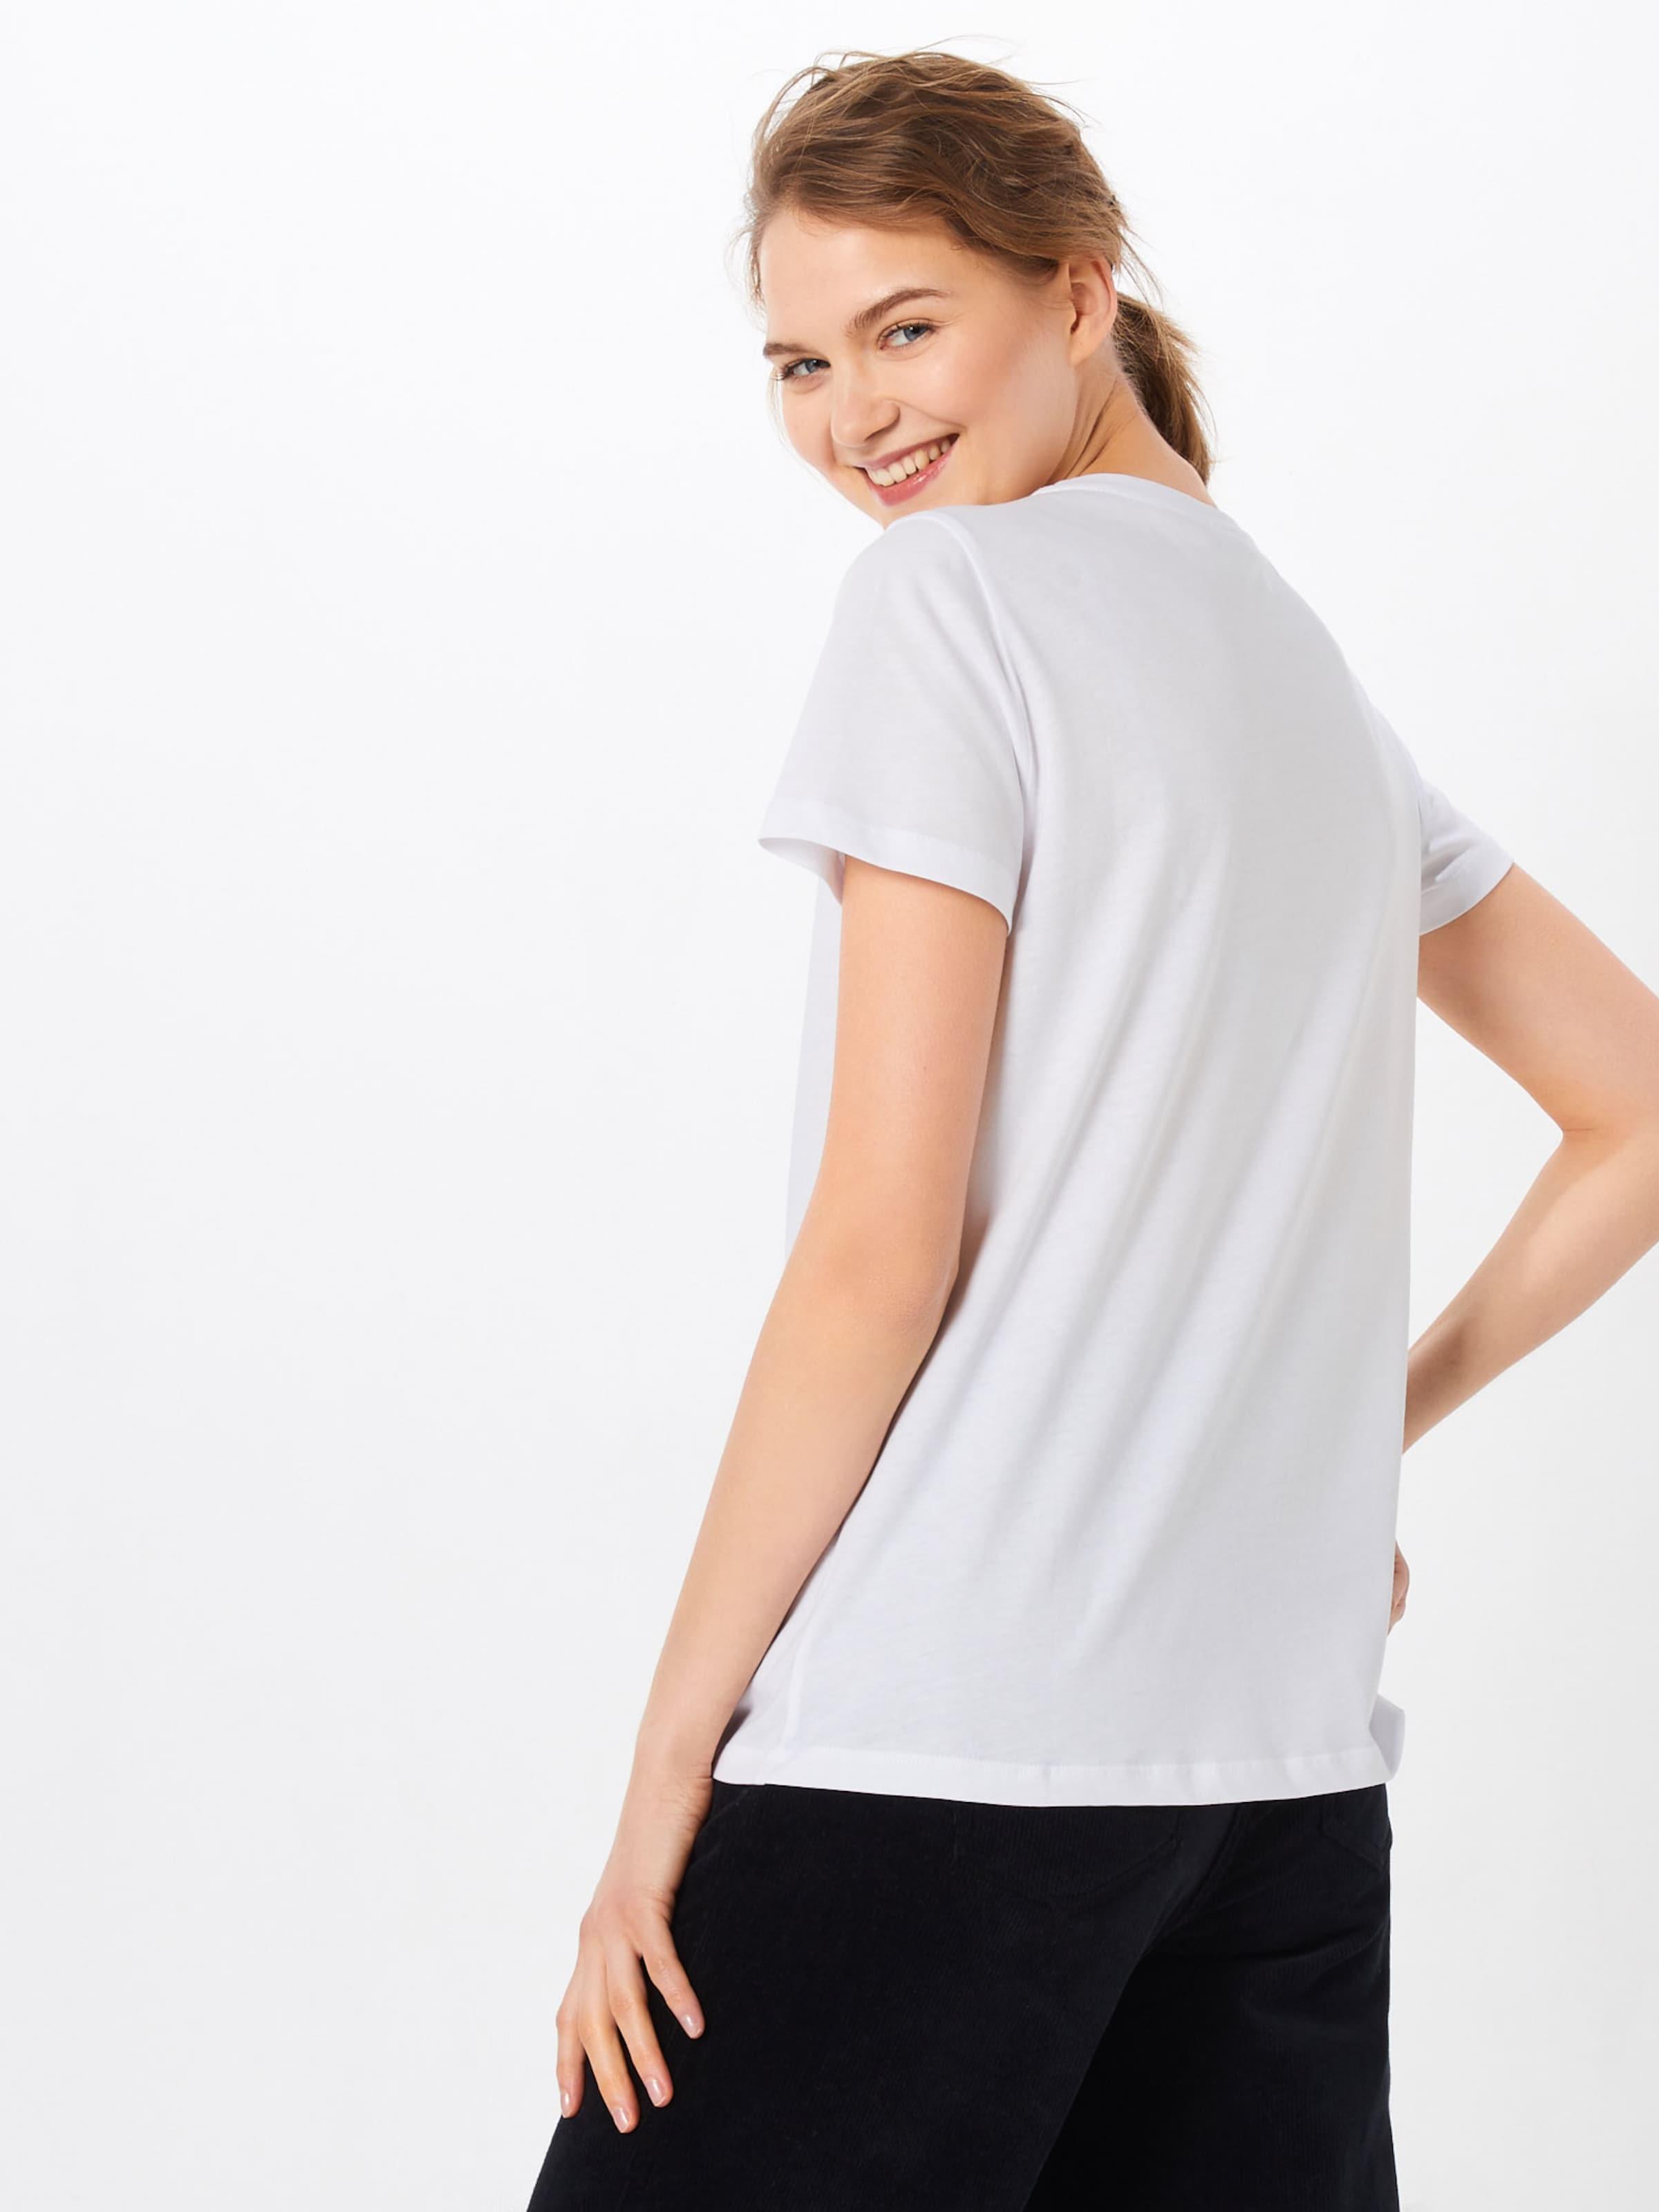 OrRose 'tinna' En Blanc Noir shirt Kaffe T tCrdxQhsB